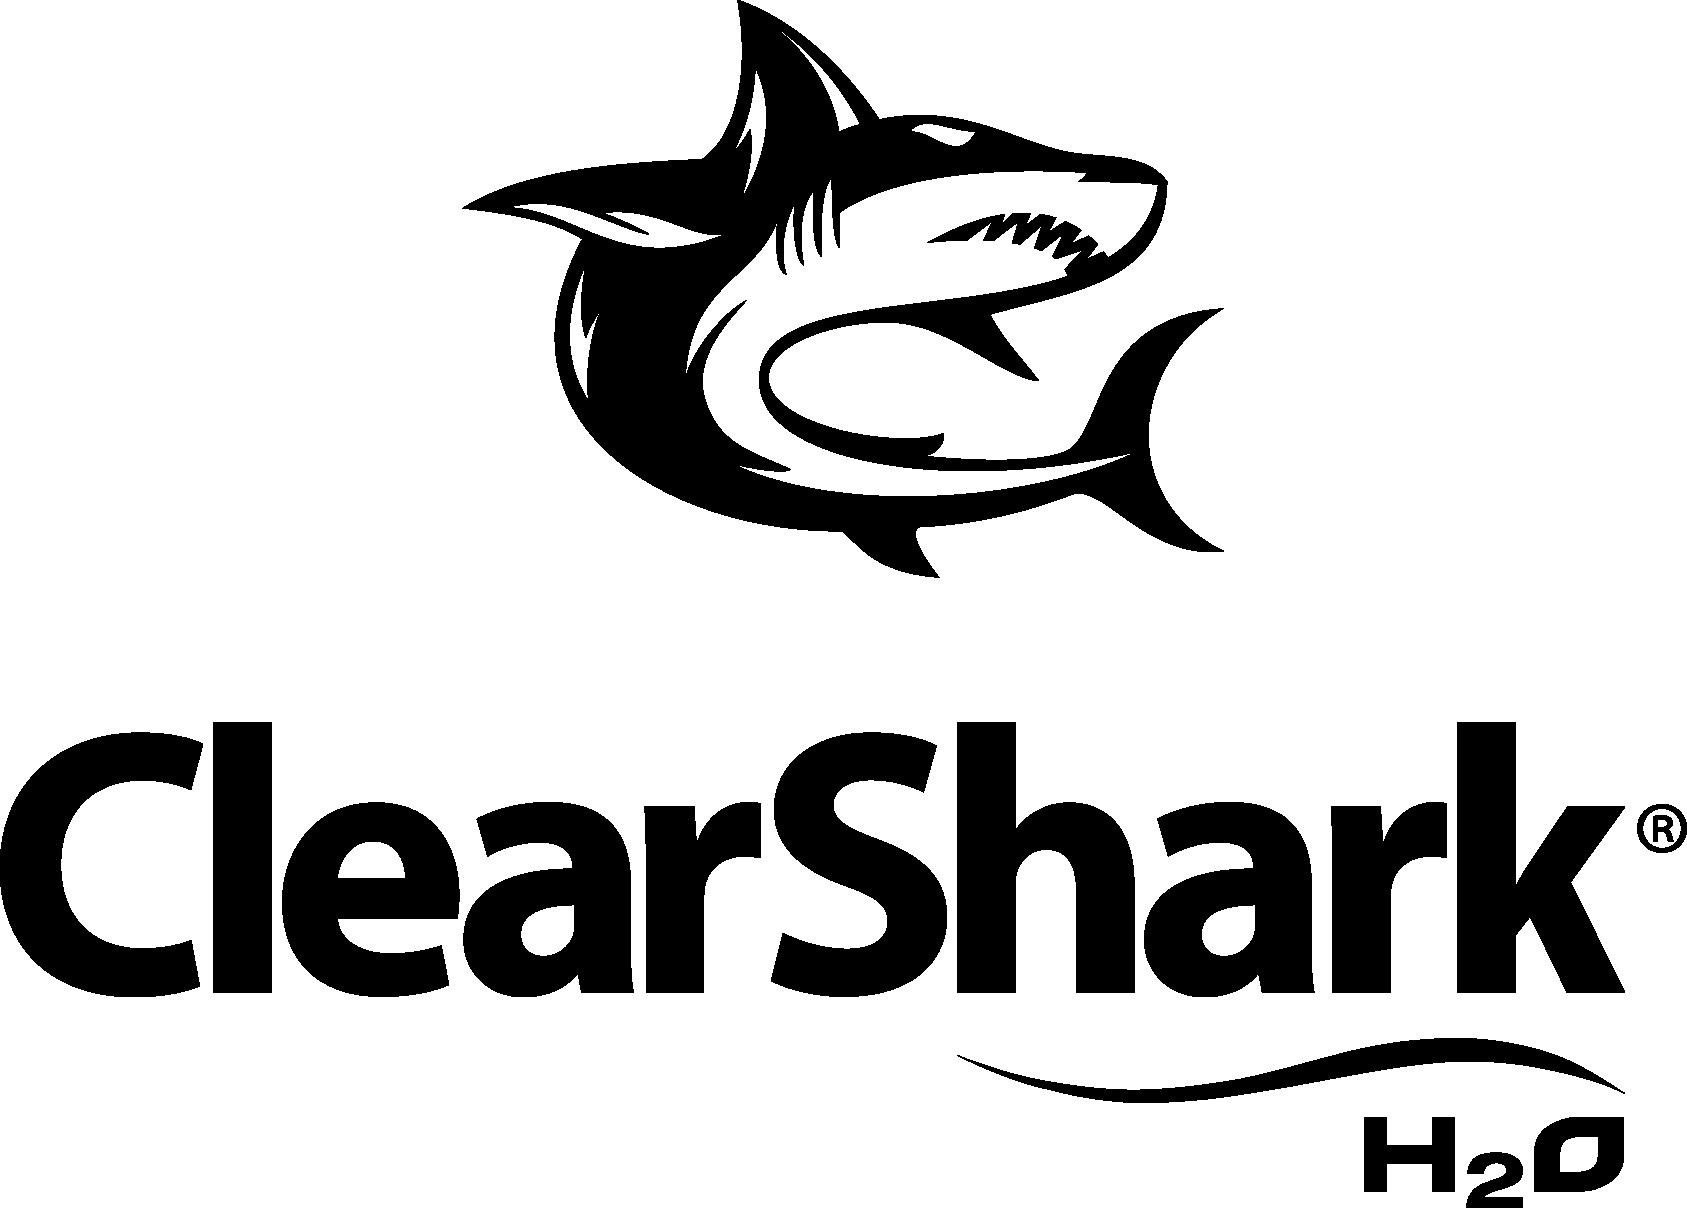 ClearSharkH2O logo